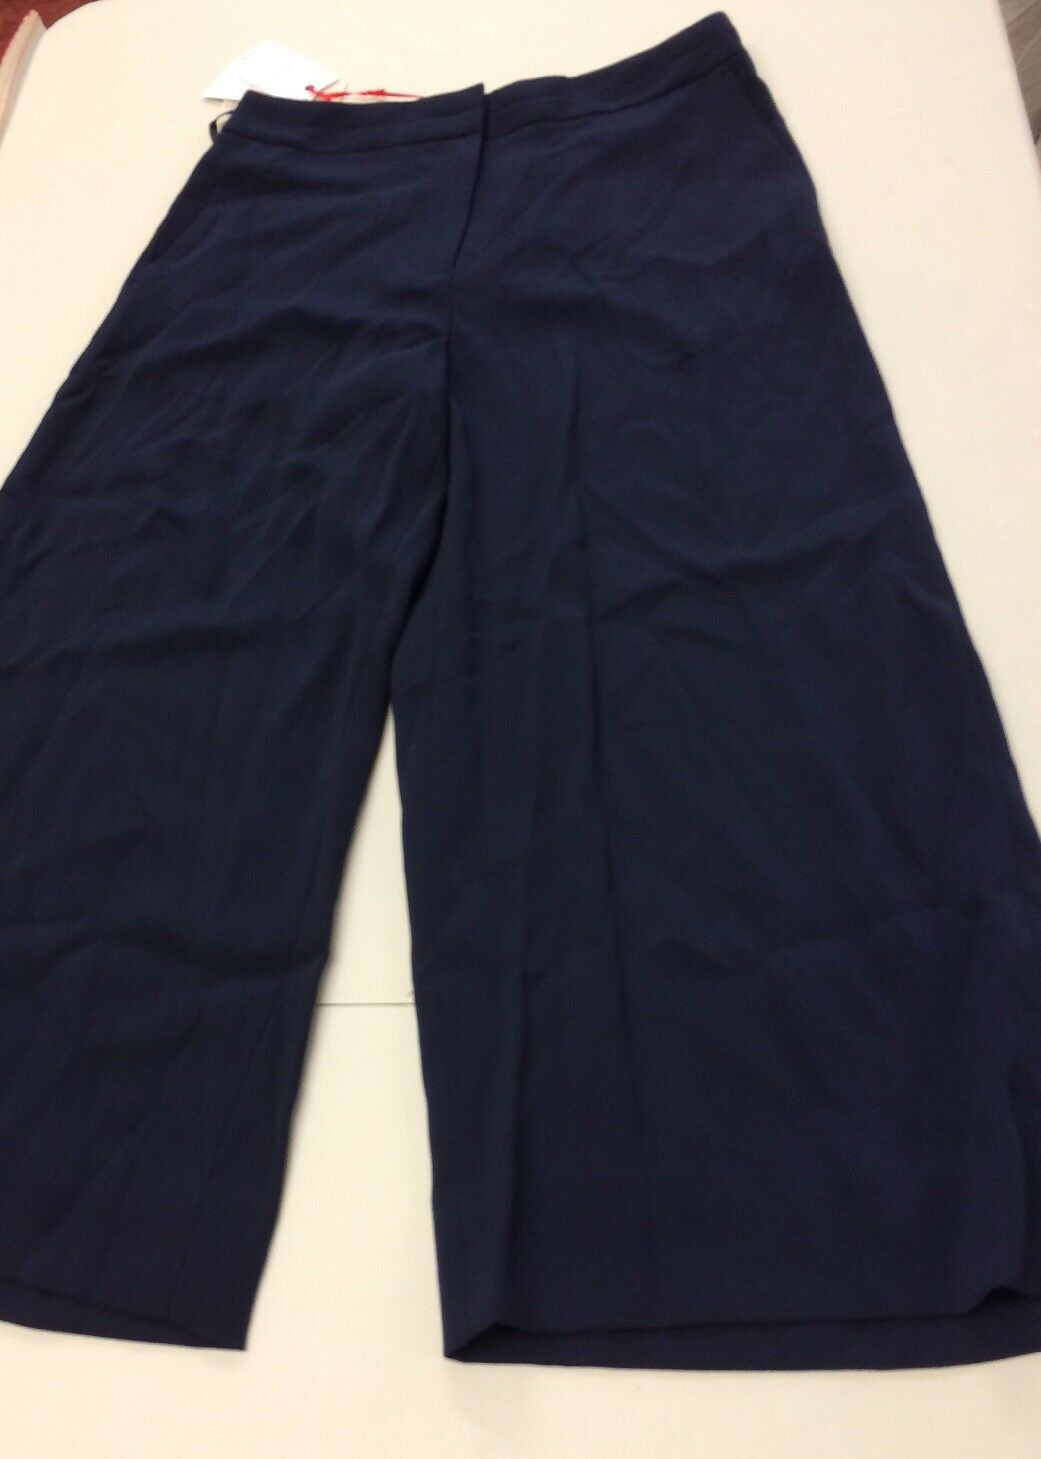 B110precis petite trousers navy Size UK10 RRP